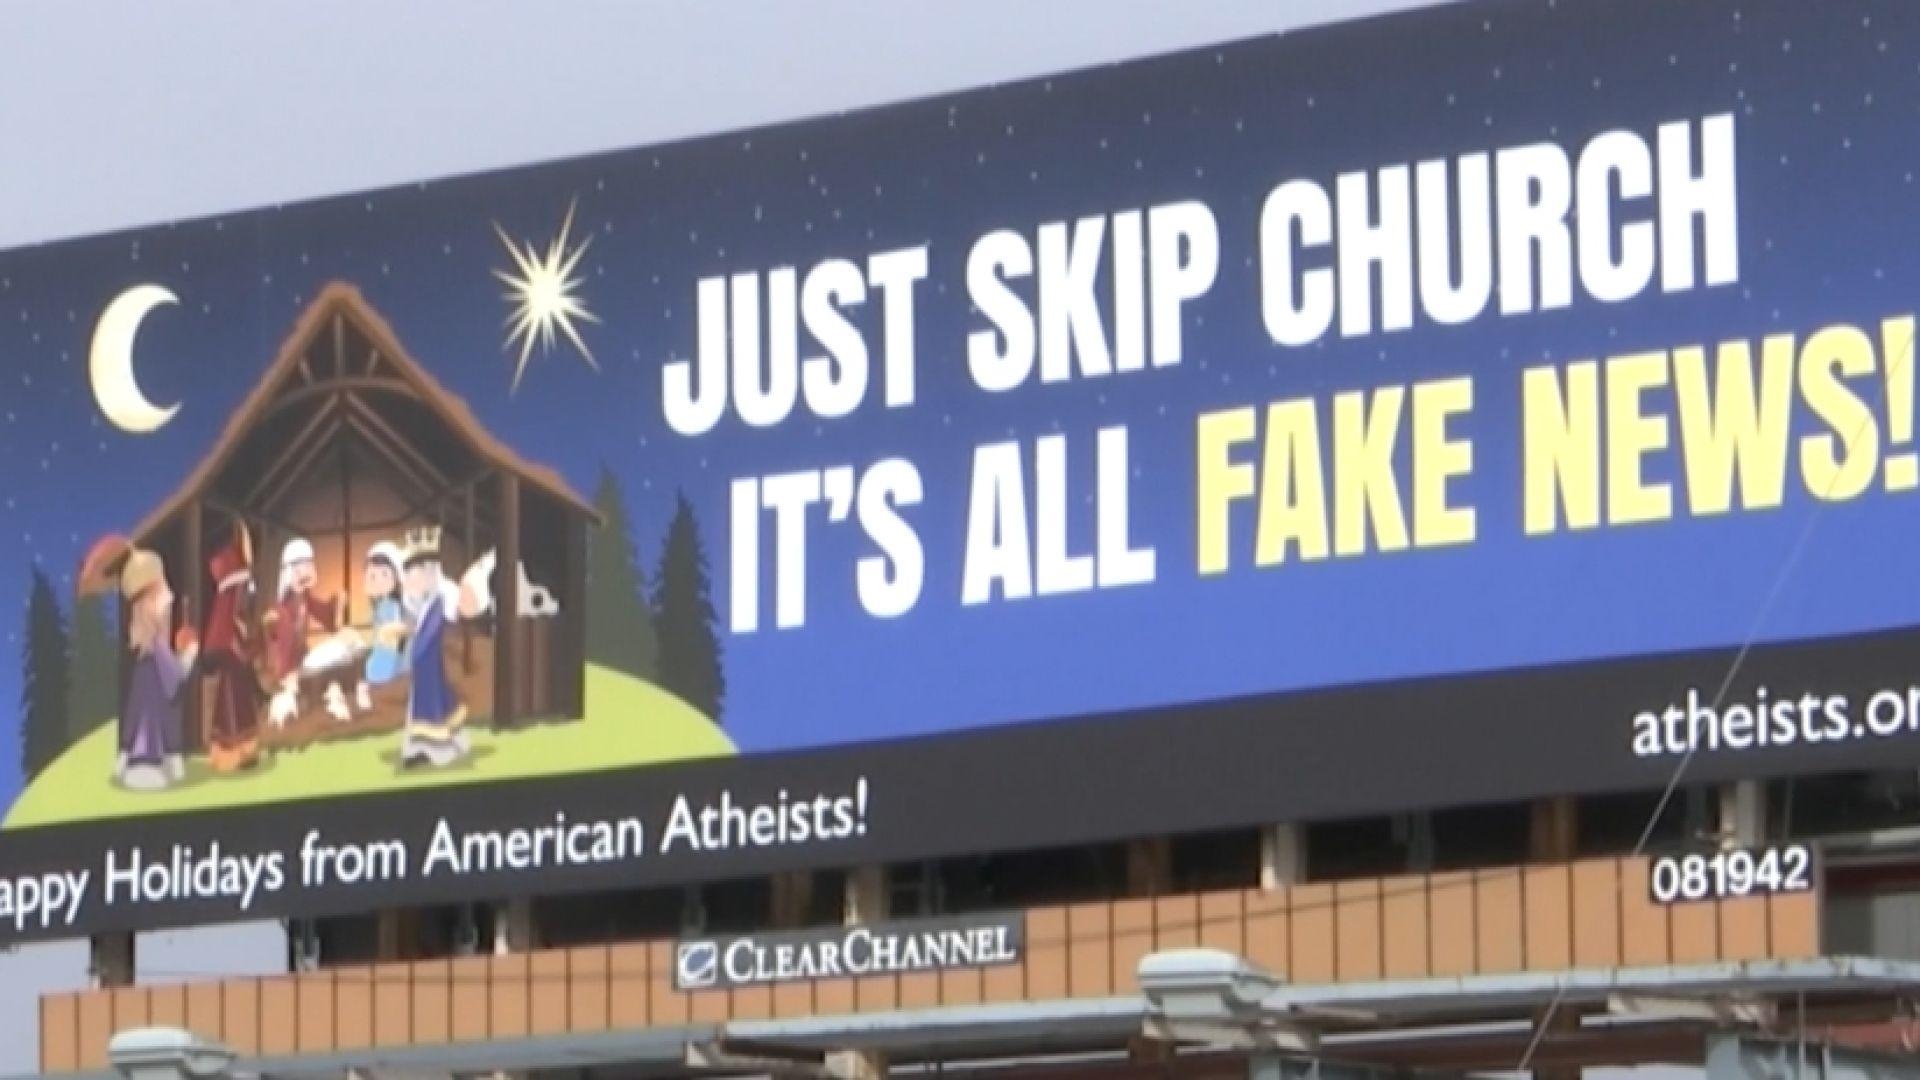 Atheist make billboard calling church 'fake news'